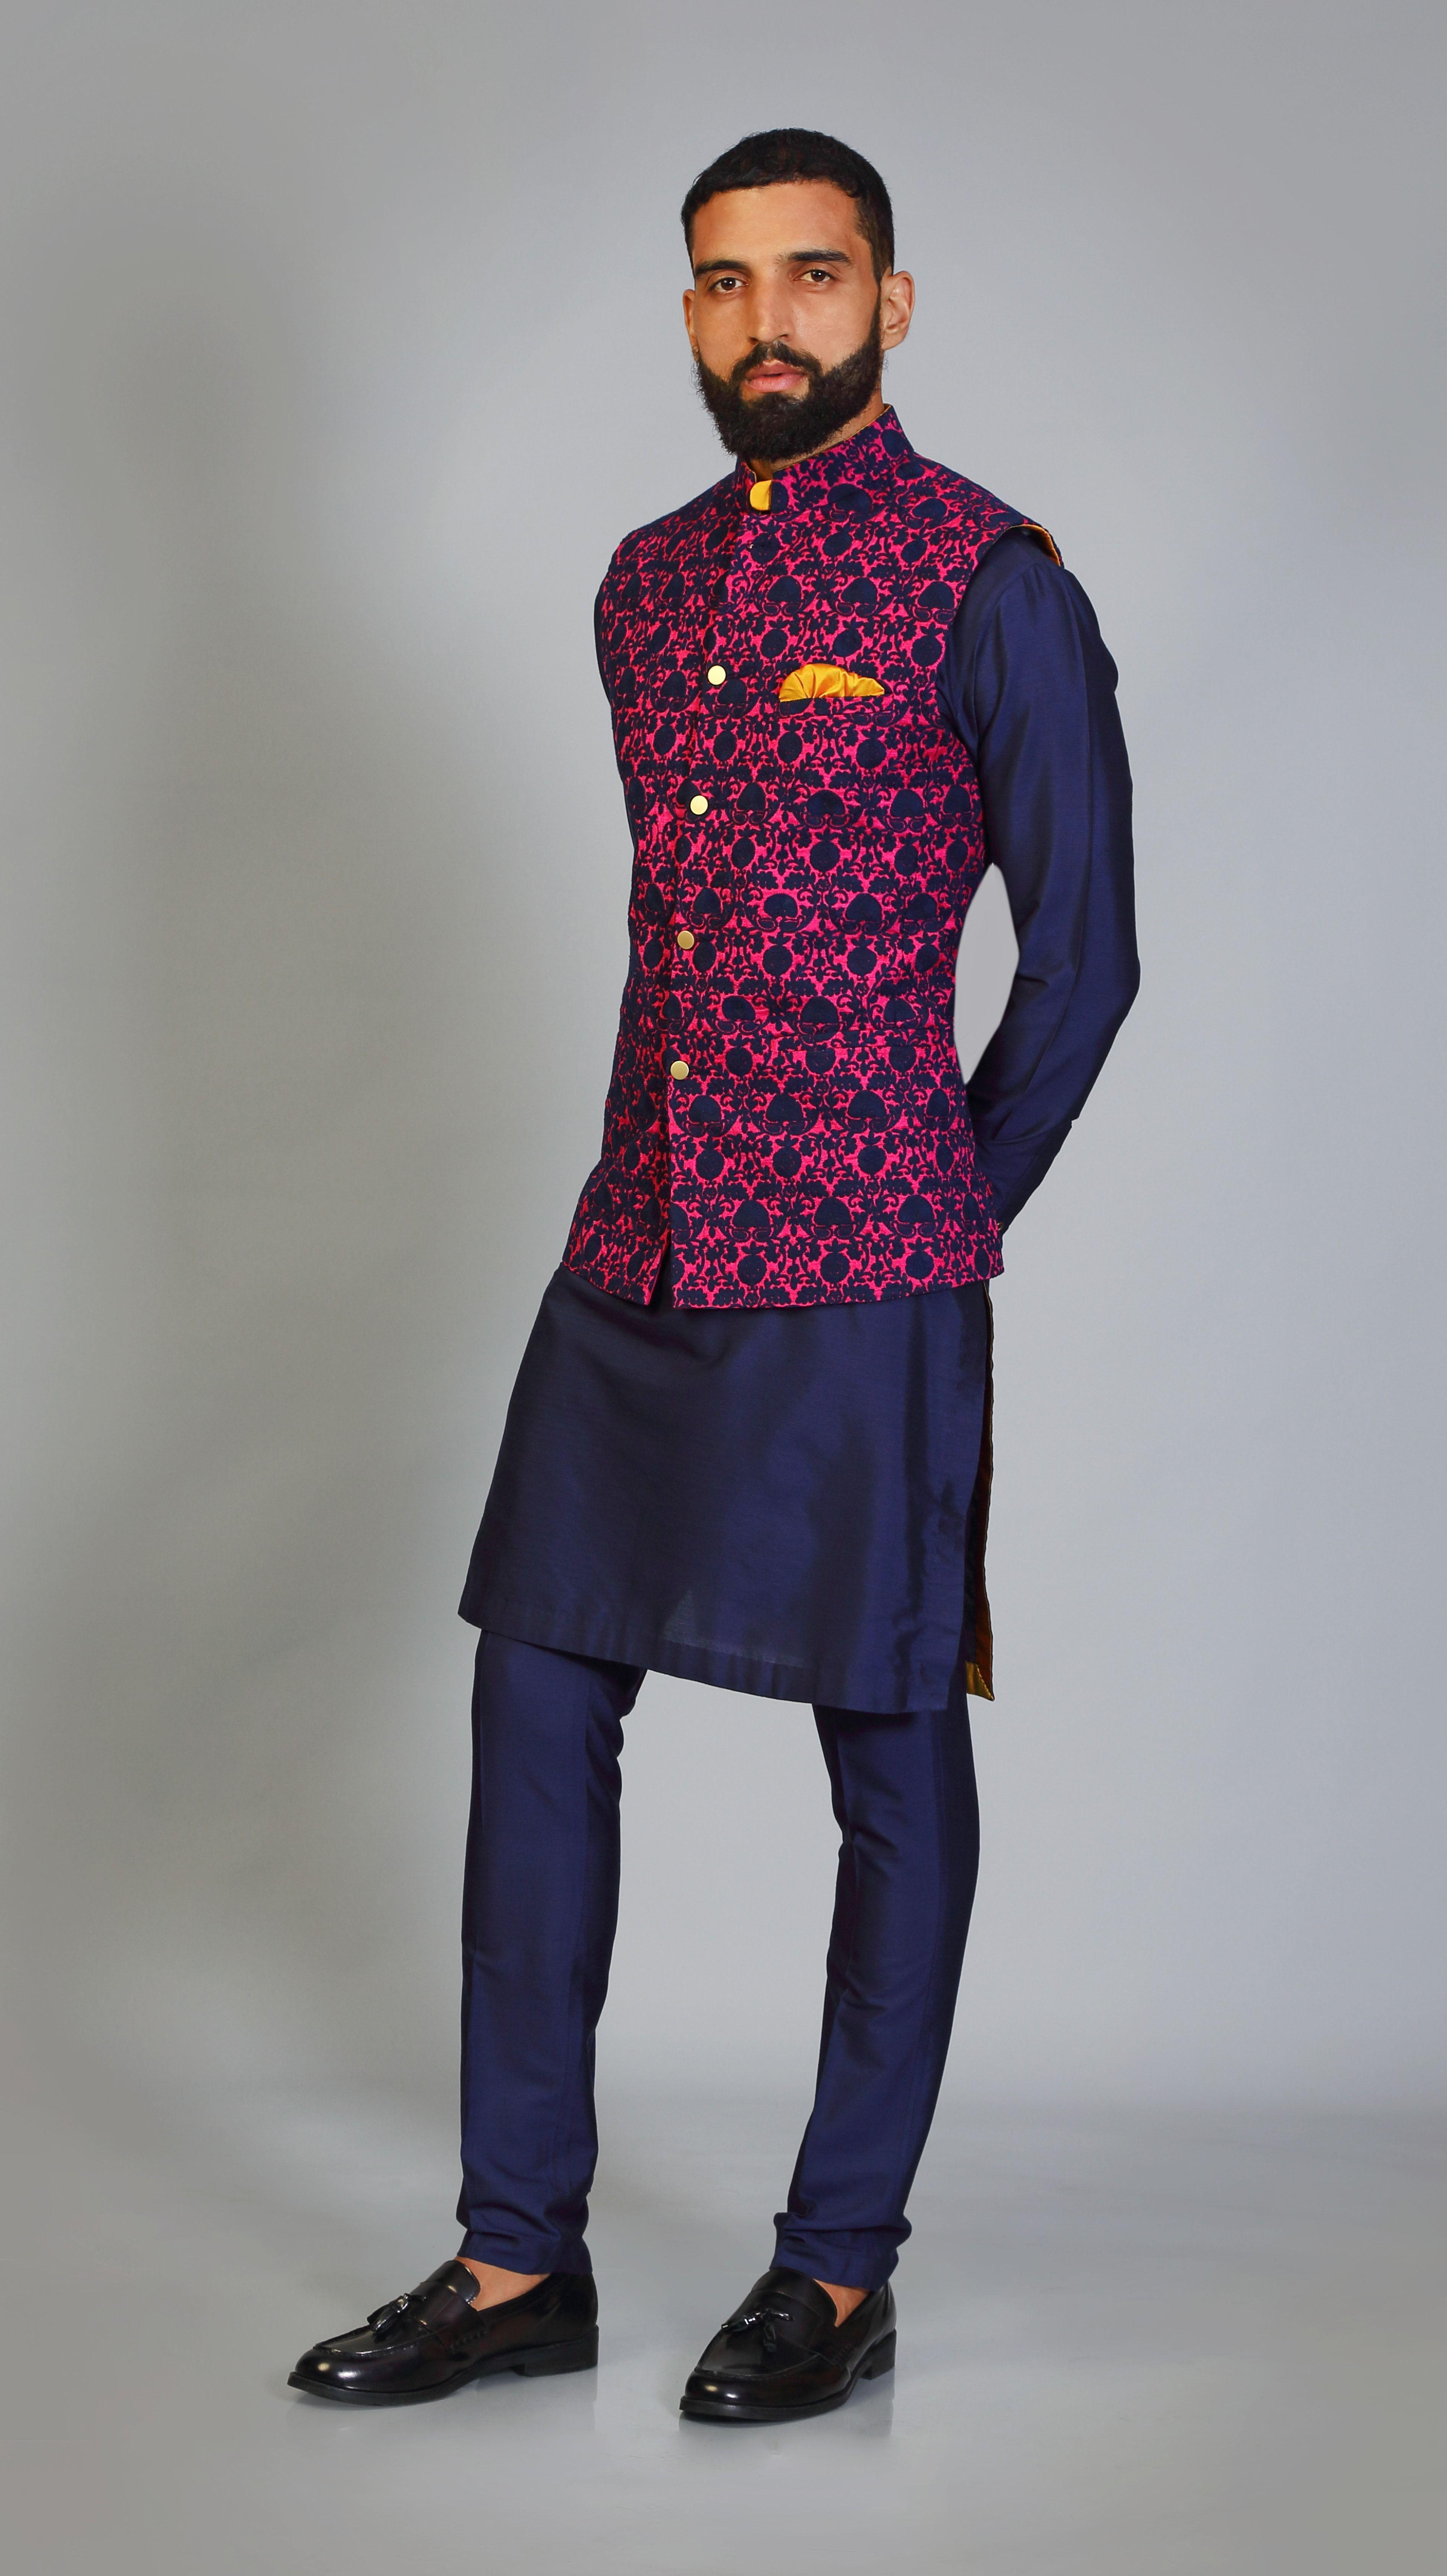 e718af2f7a Fushia #blue #dori_work #color_supress #technique #sadri #kurta #pants  #puneetandnidhi